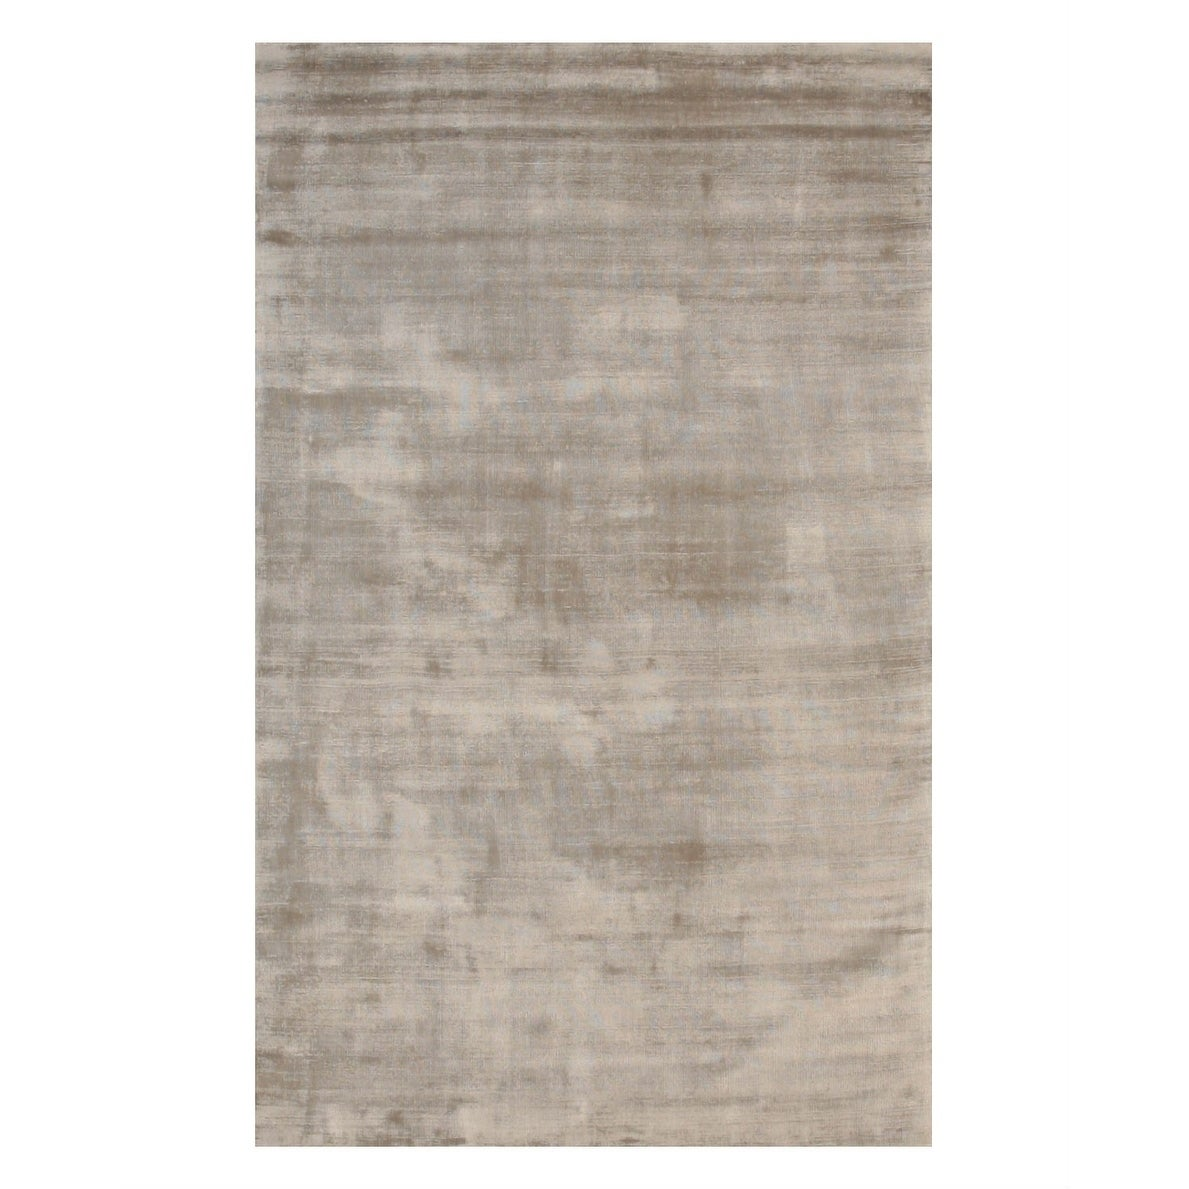 Handmade-Viscose-Gray-Contemporary-Solid-Random-cut-Pile-Rug-5-x-8-3c908ef5-d85c-48ba-9101-18175752003a.jpg